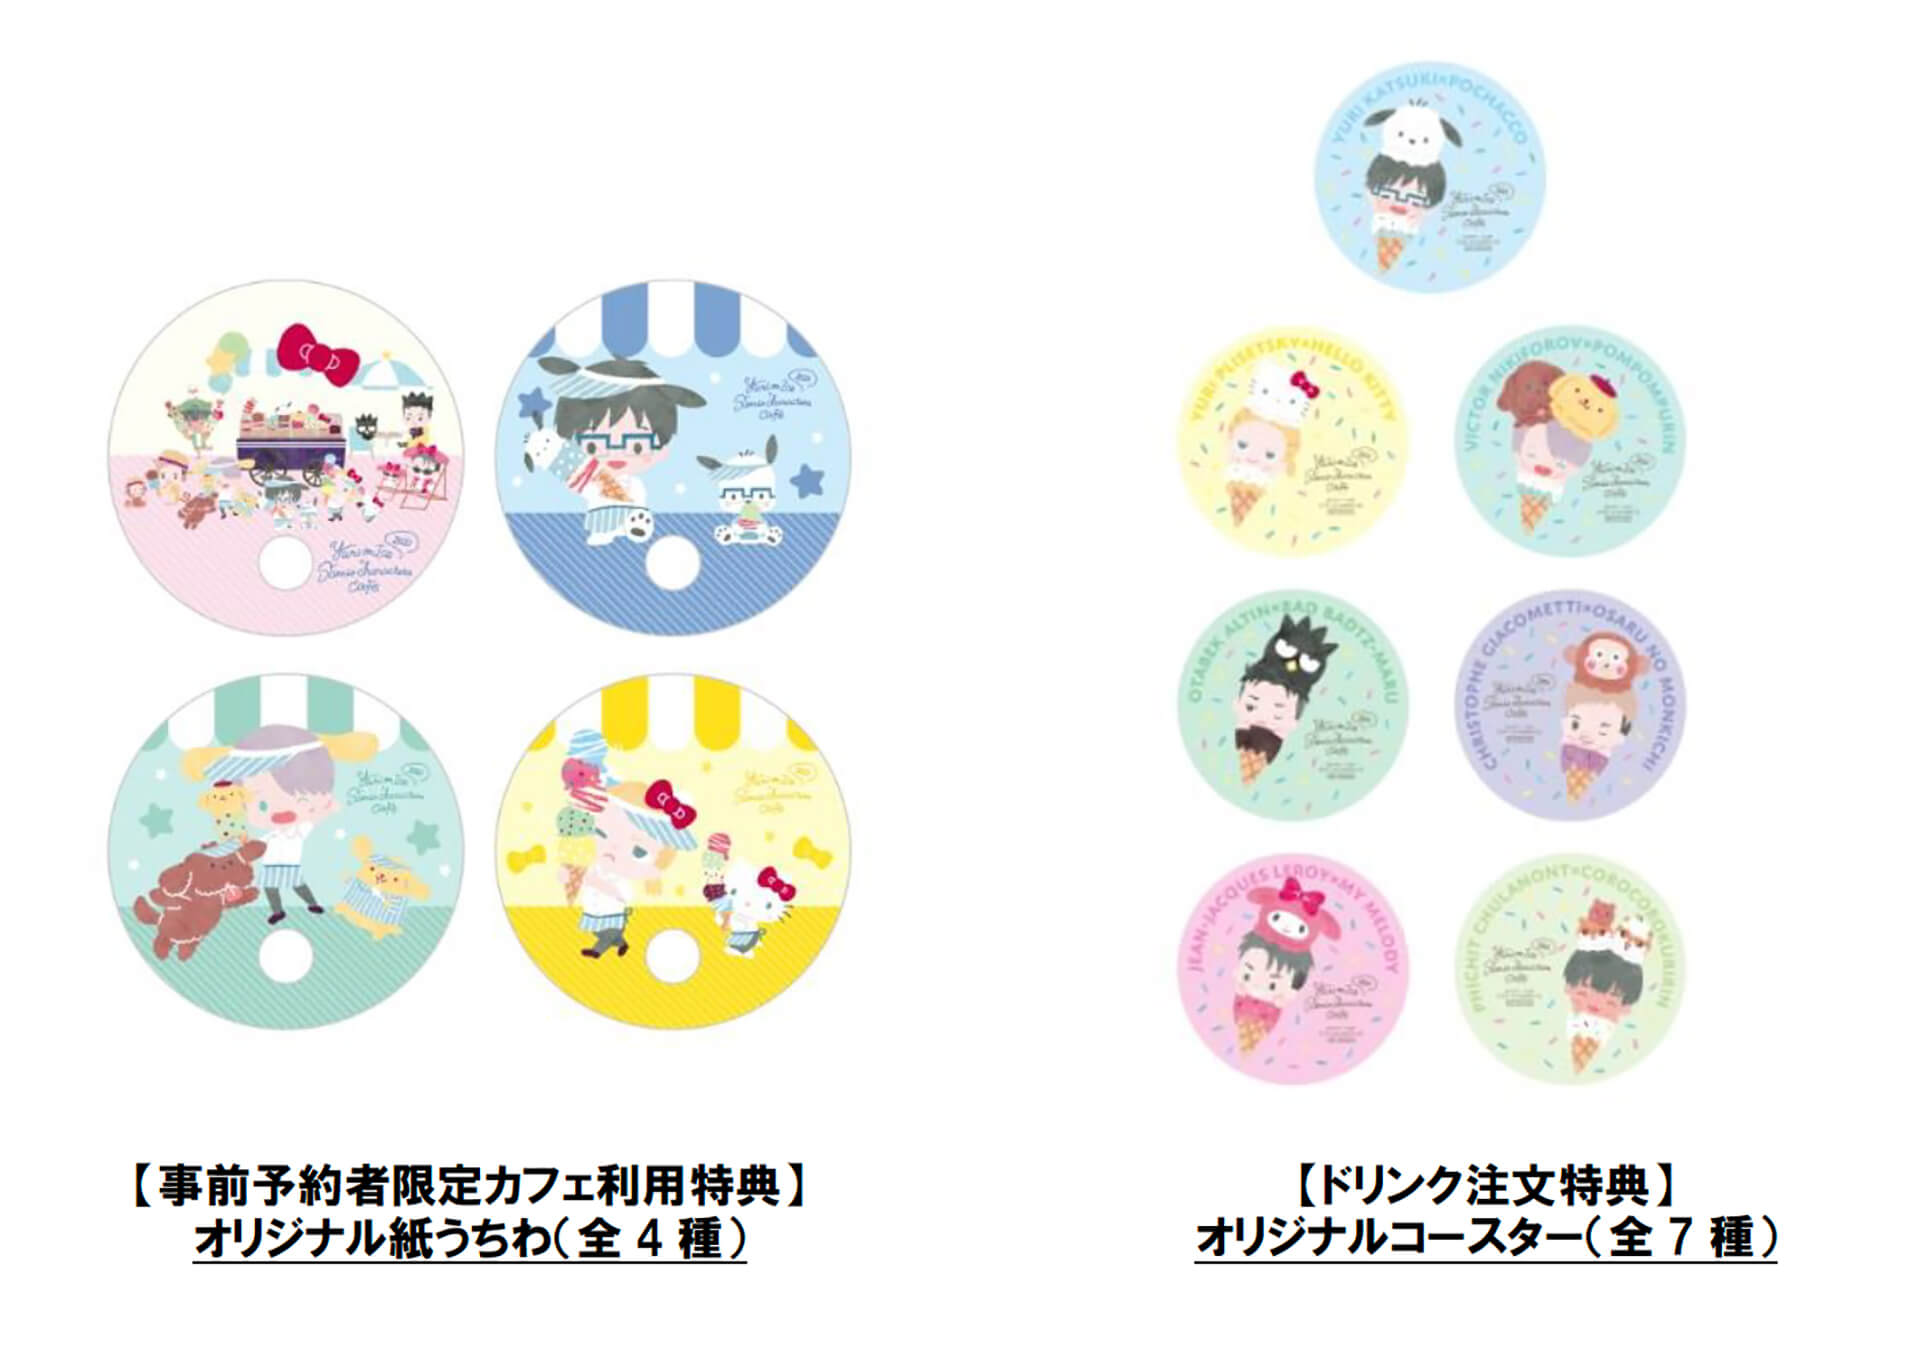 Yuri on Ice×Sanrio characters Cafe 2020